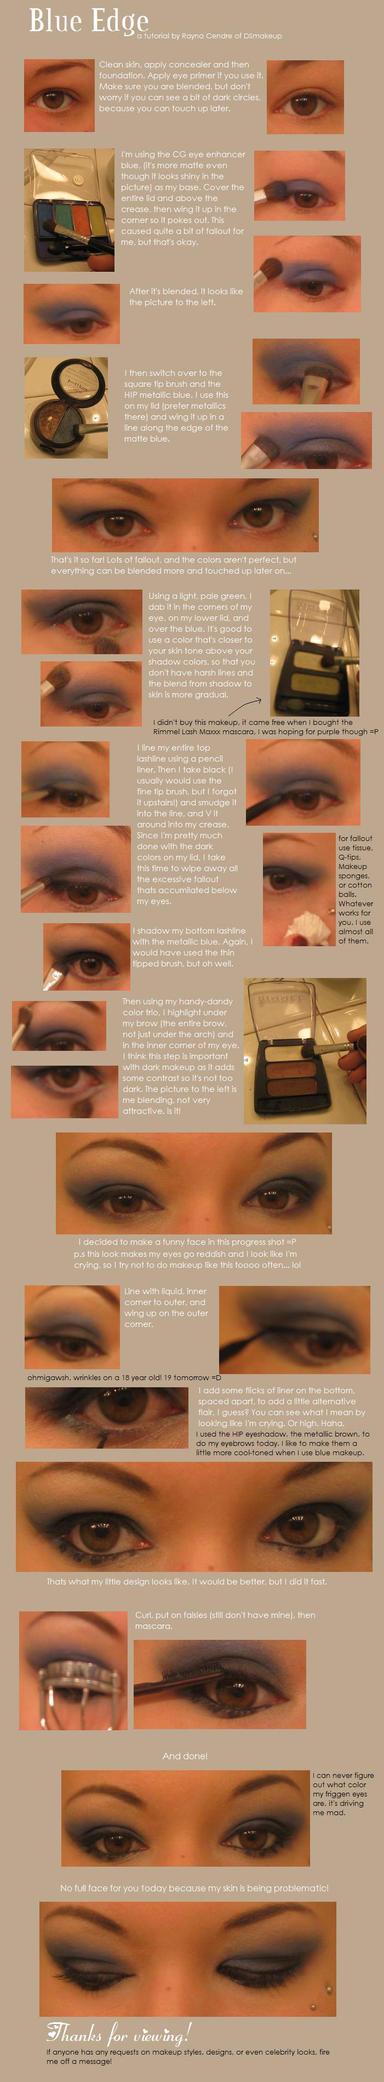 Blue Edge Makeup Tutorial by DSmakeup